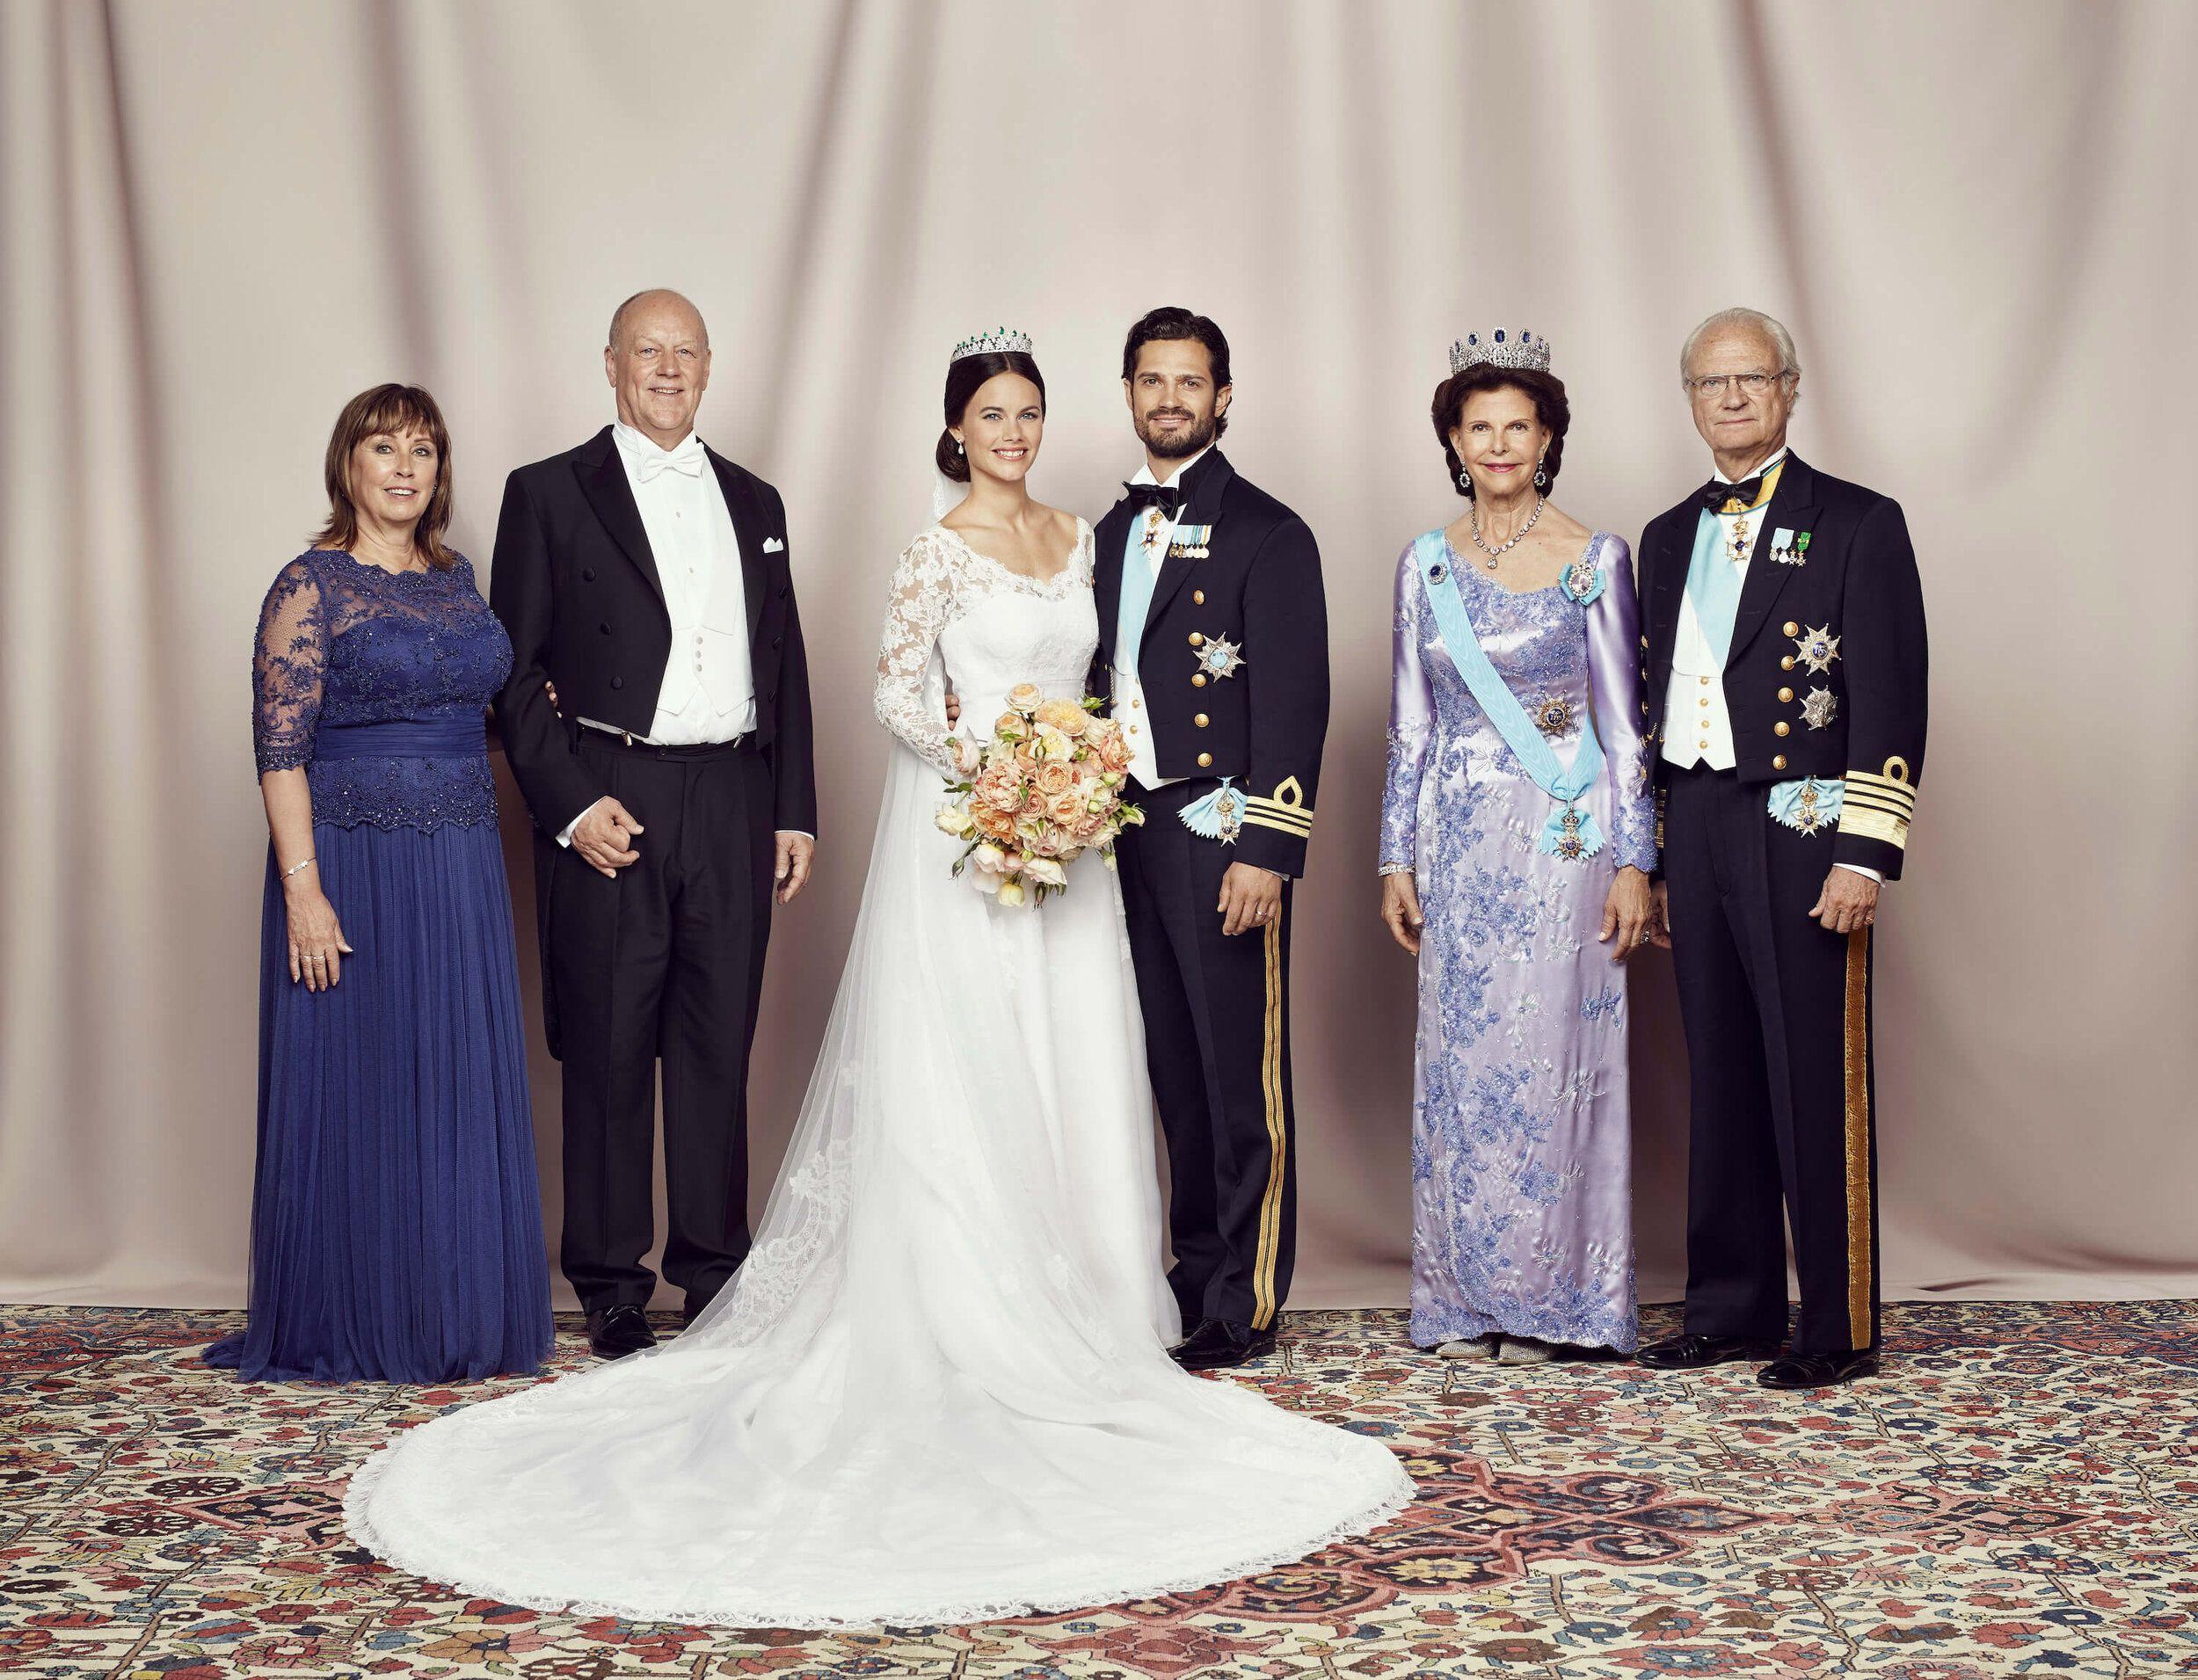 Prinz Carl Philip Alle Fakten Im Uberblick Kleid Hochzeit Prinz Carl Philip Brautjungfernkleid